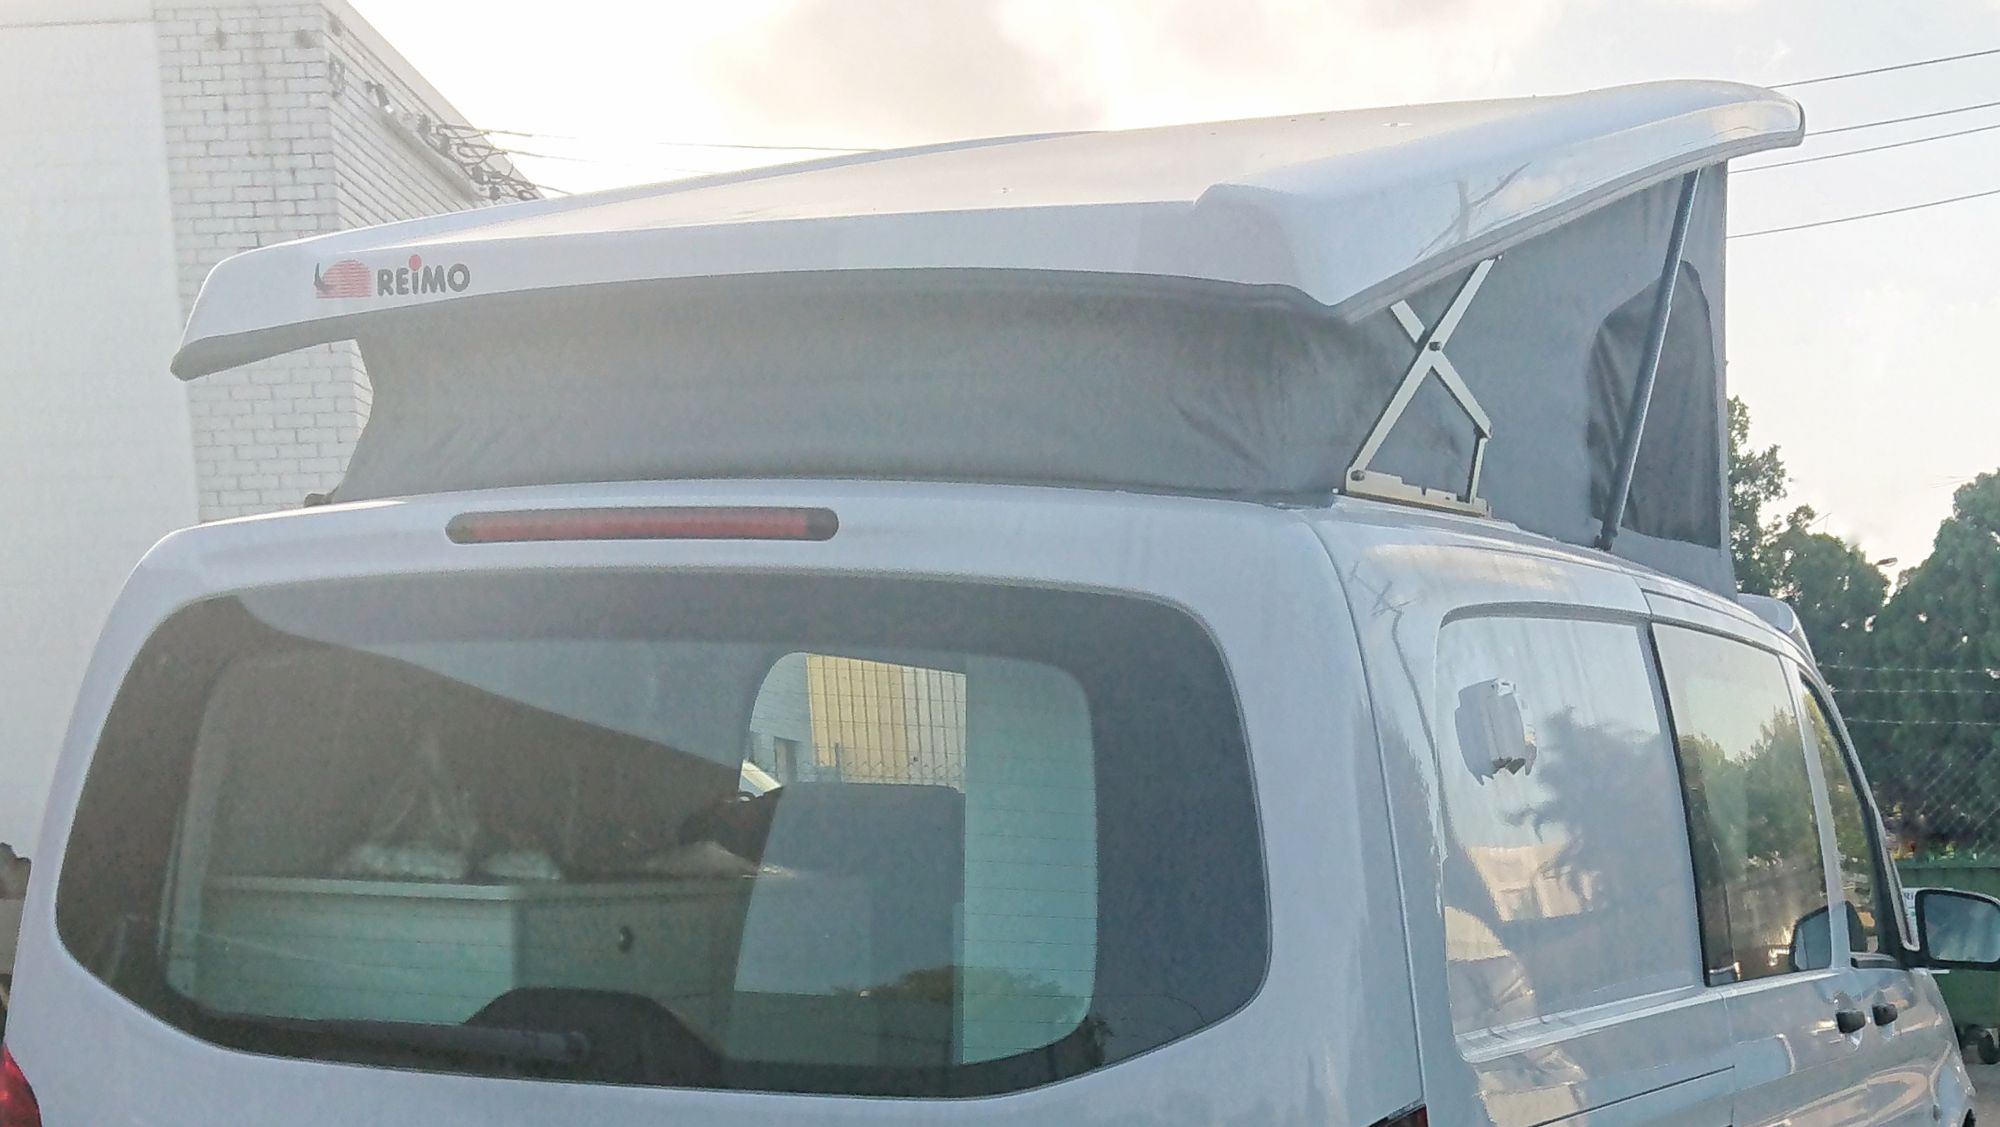 Reimo roof Mercedes Vito MWB 2018